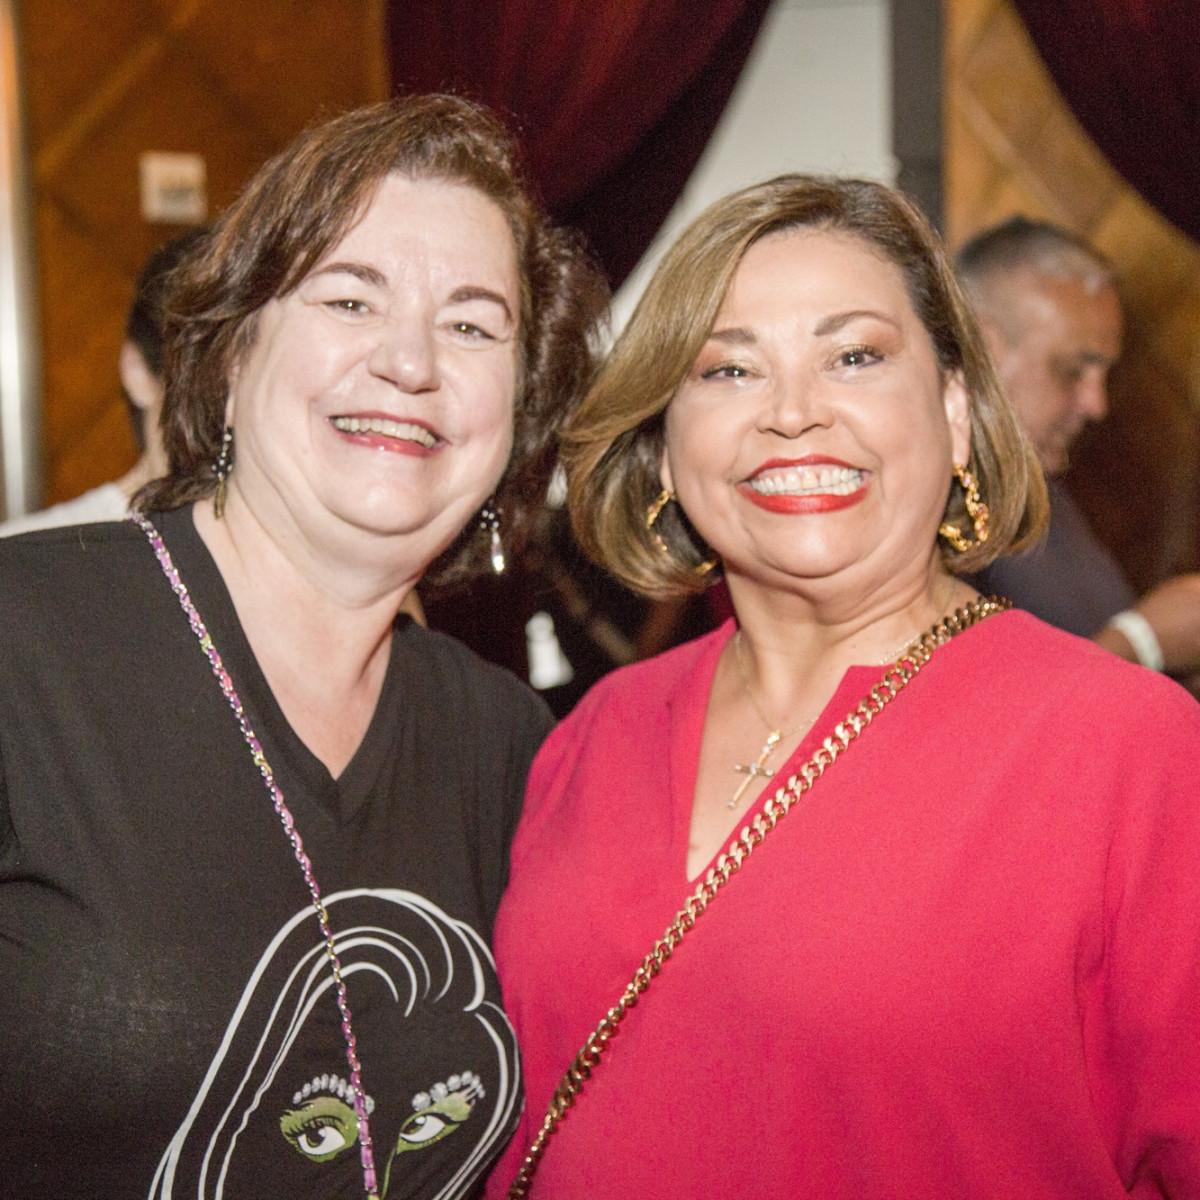 News, Shelby, Legacy Mint Julep party, July 2015, Katy Caldwell, Linda Cantu